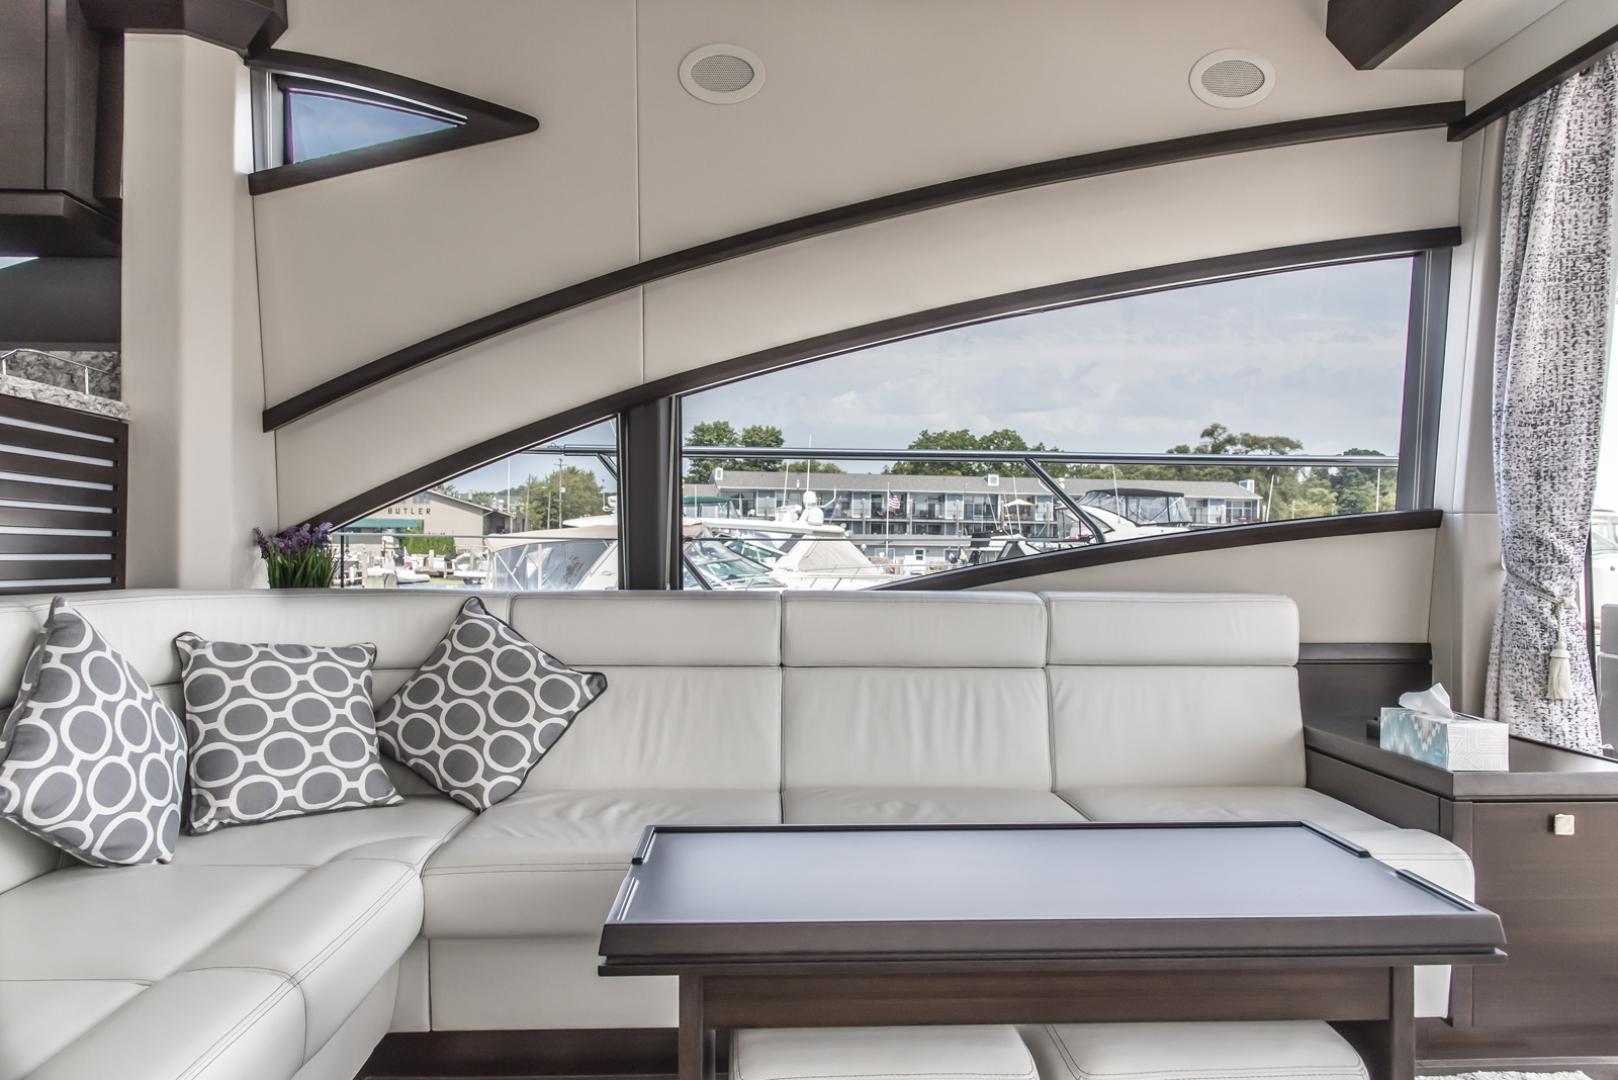 Neptunus-Motor Yacht Express 2018-LIQUID WISDOM Grand Haven-Michigan-United States-Salon to stbd-1484957 | Thumbnail